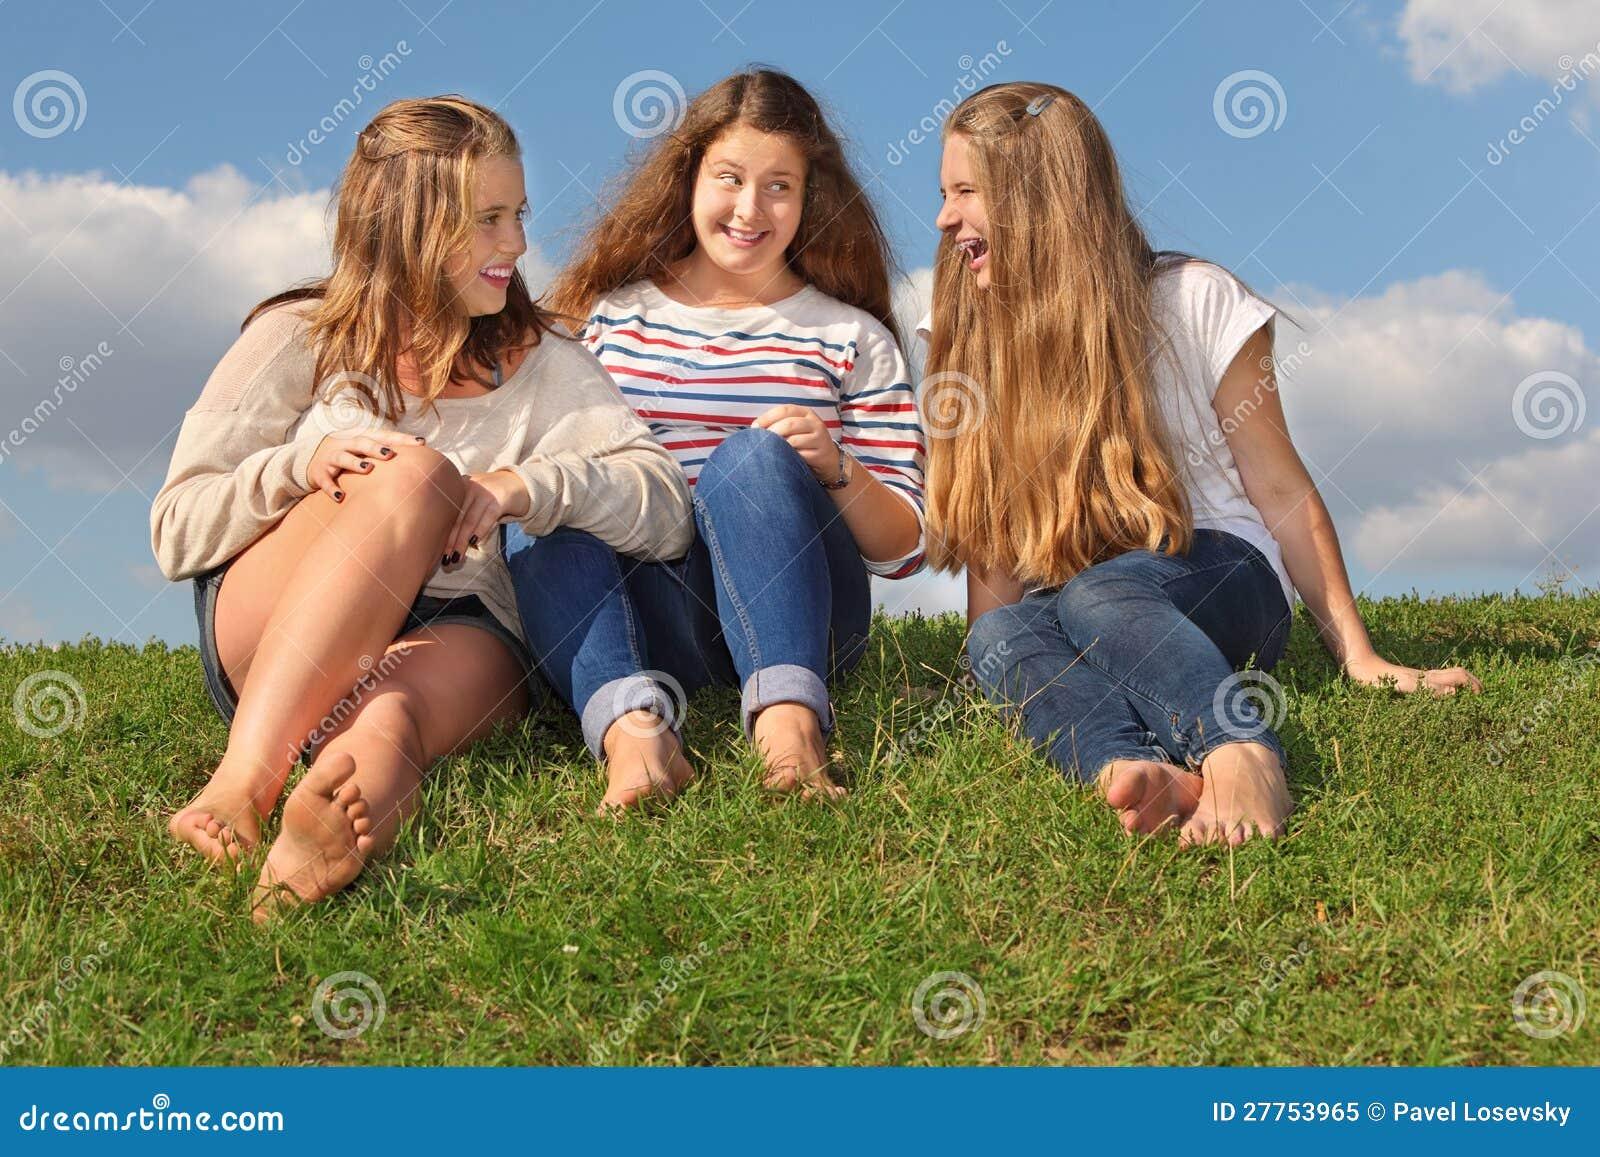 verbazingwekkend meisjes gezicht zitten